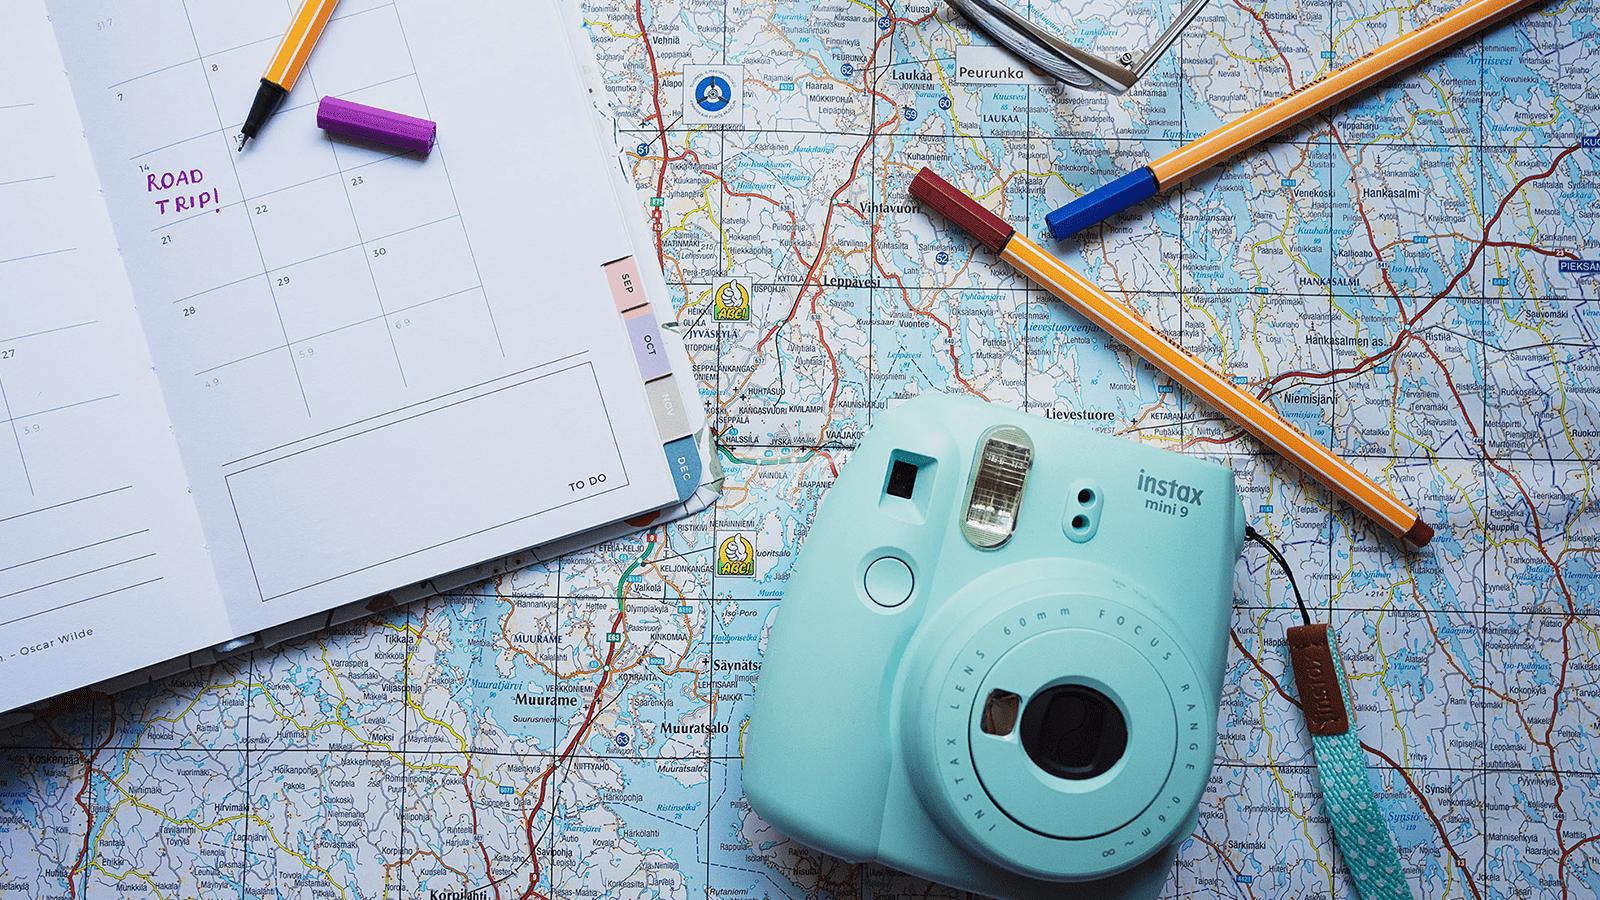 Display of a camera, pens, a calendar and a map